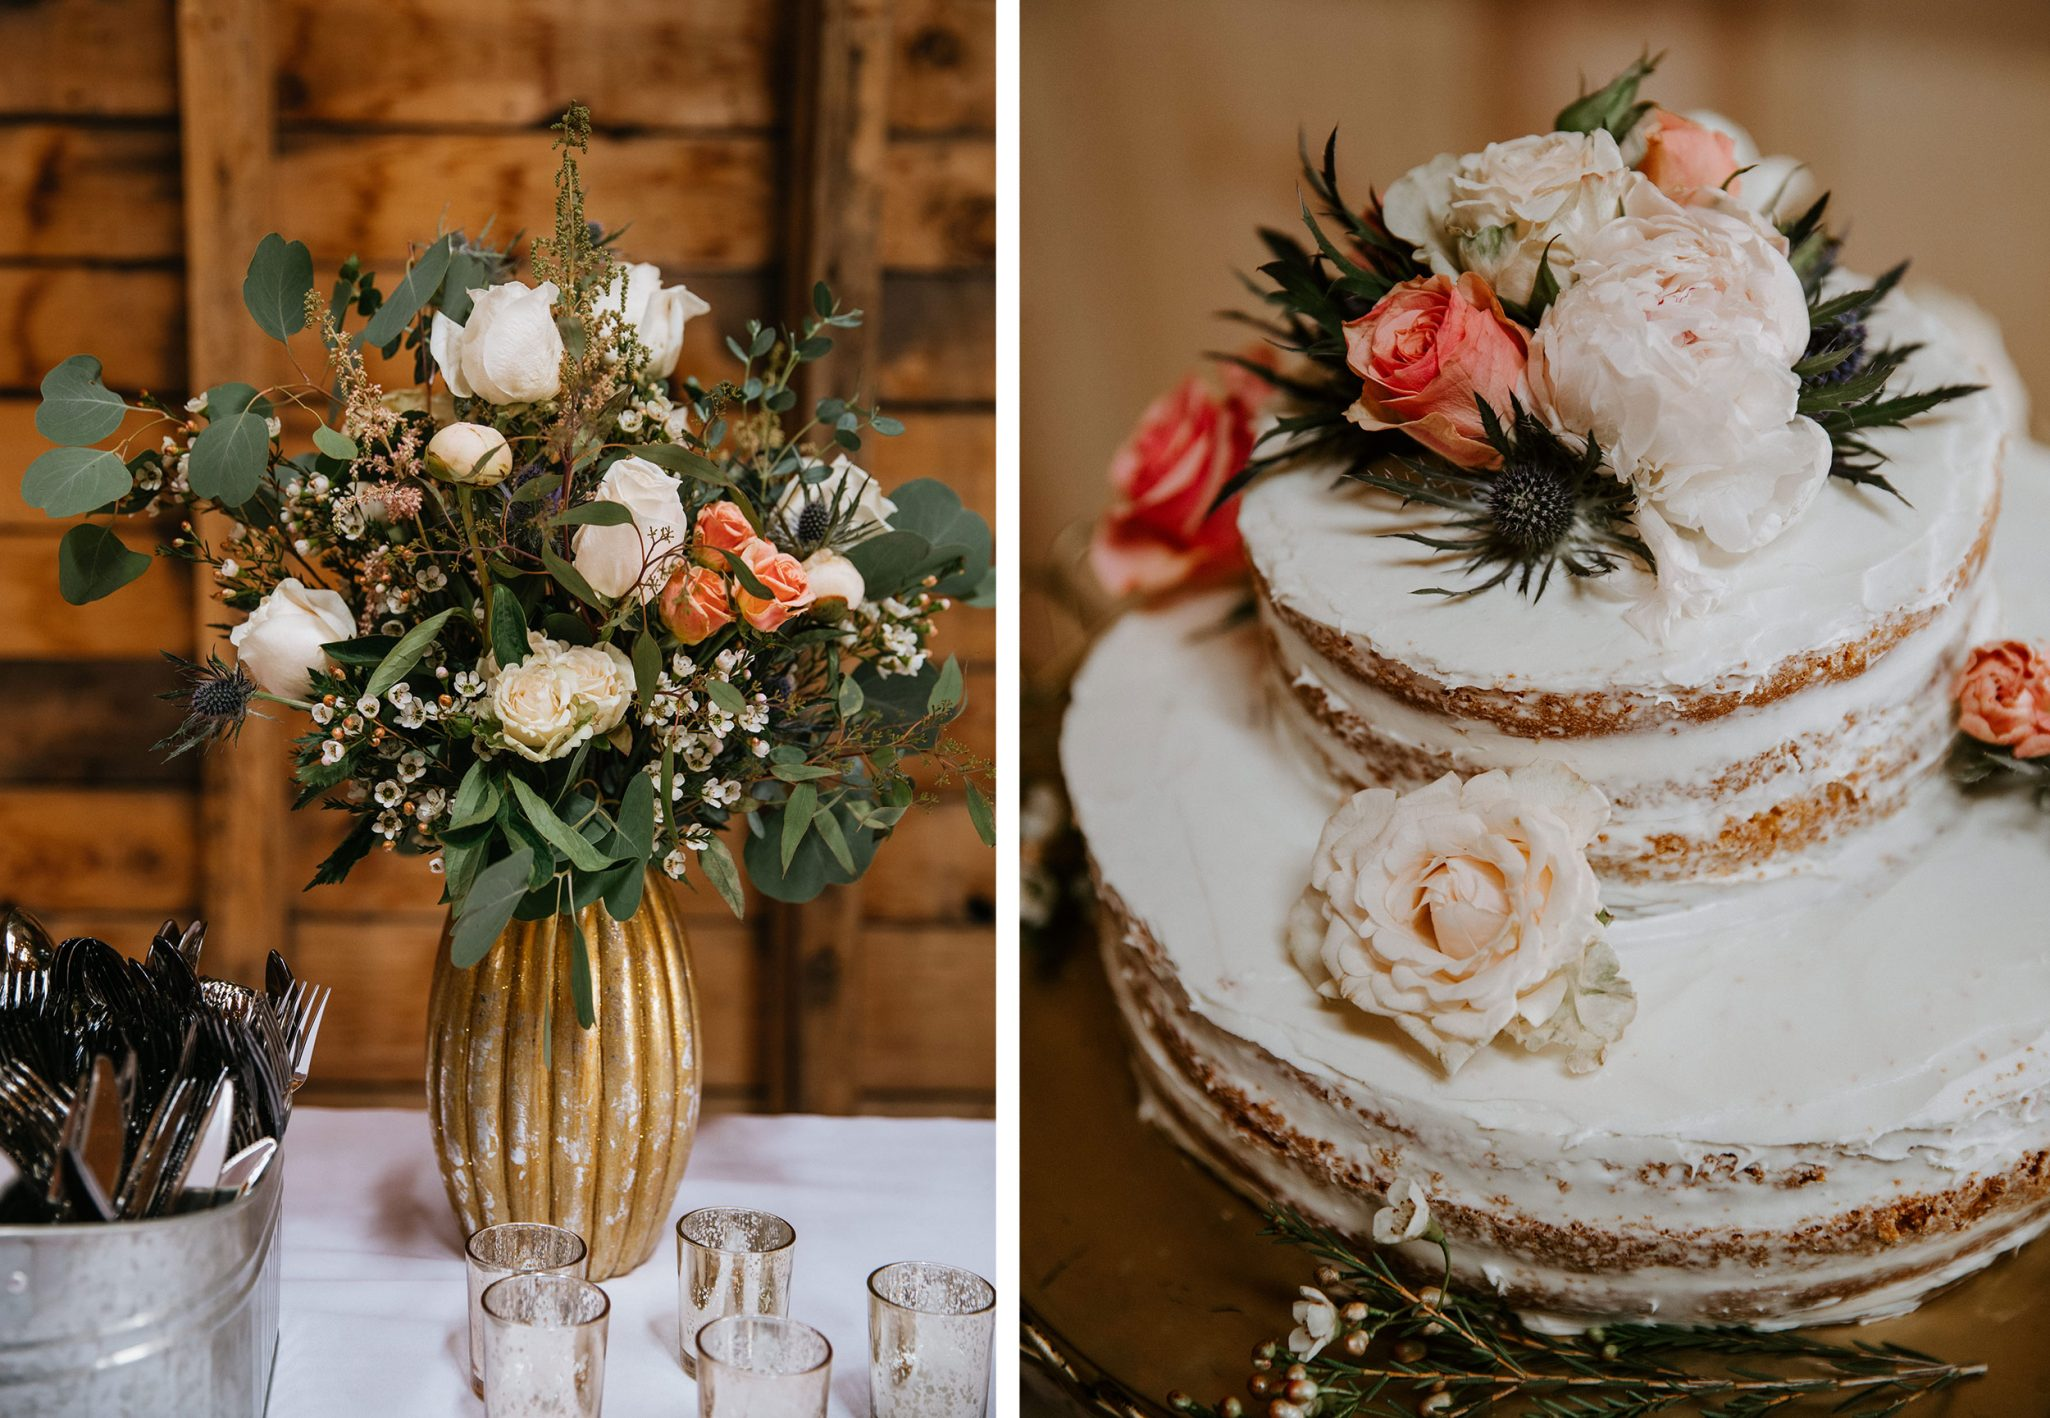 Wedding cake & florals - Durango Weddings Magazine